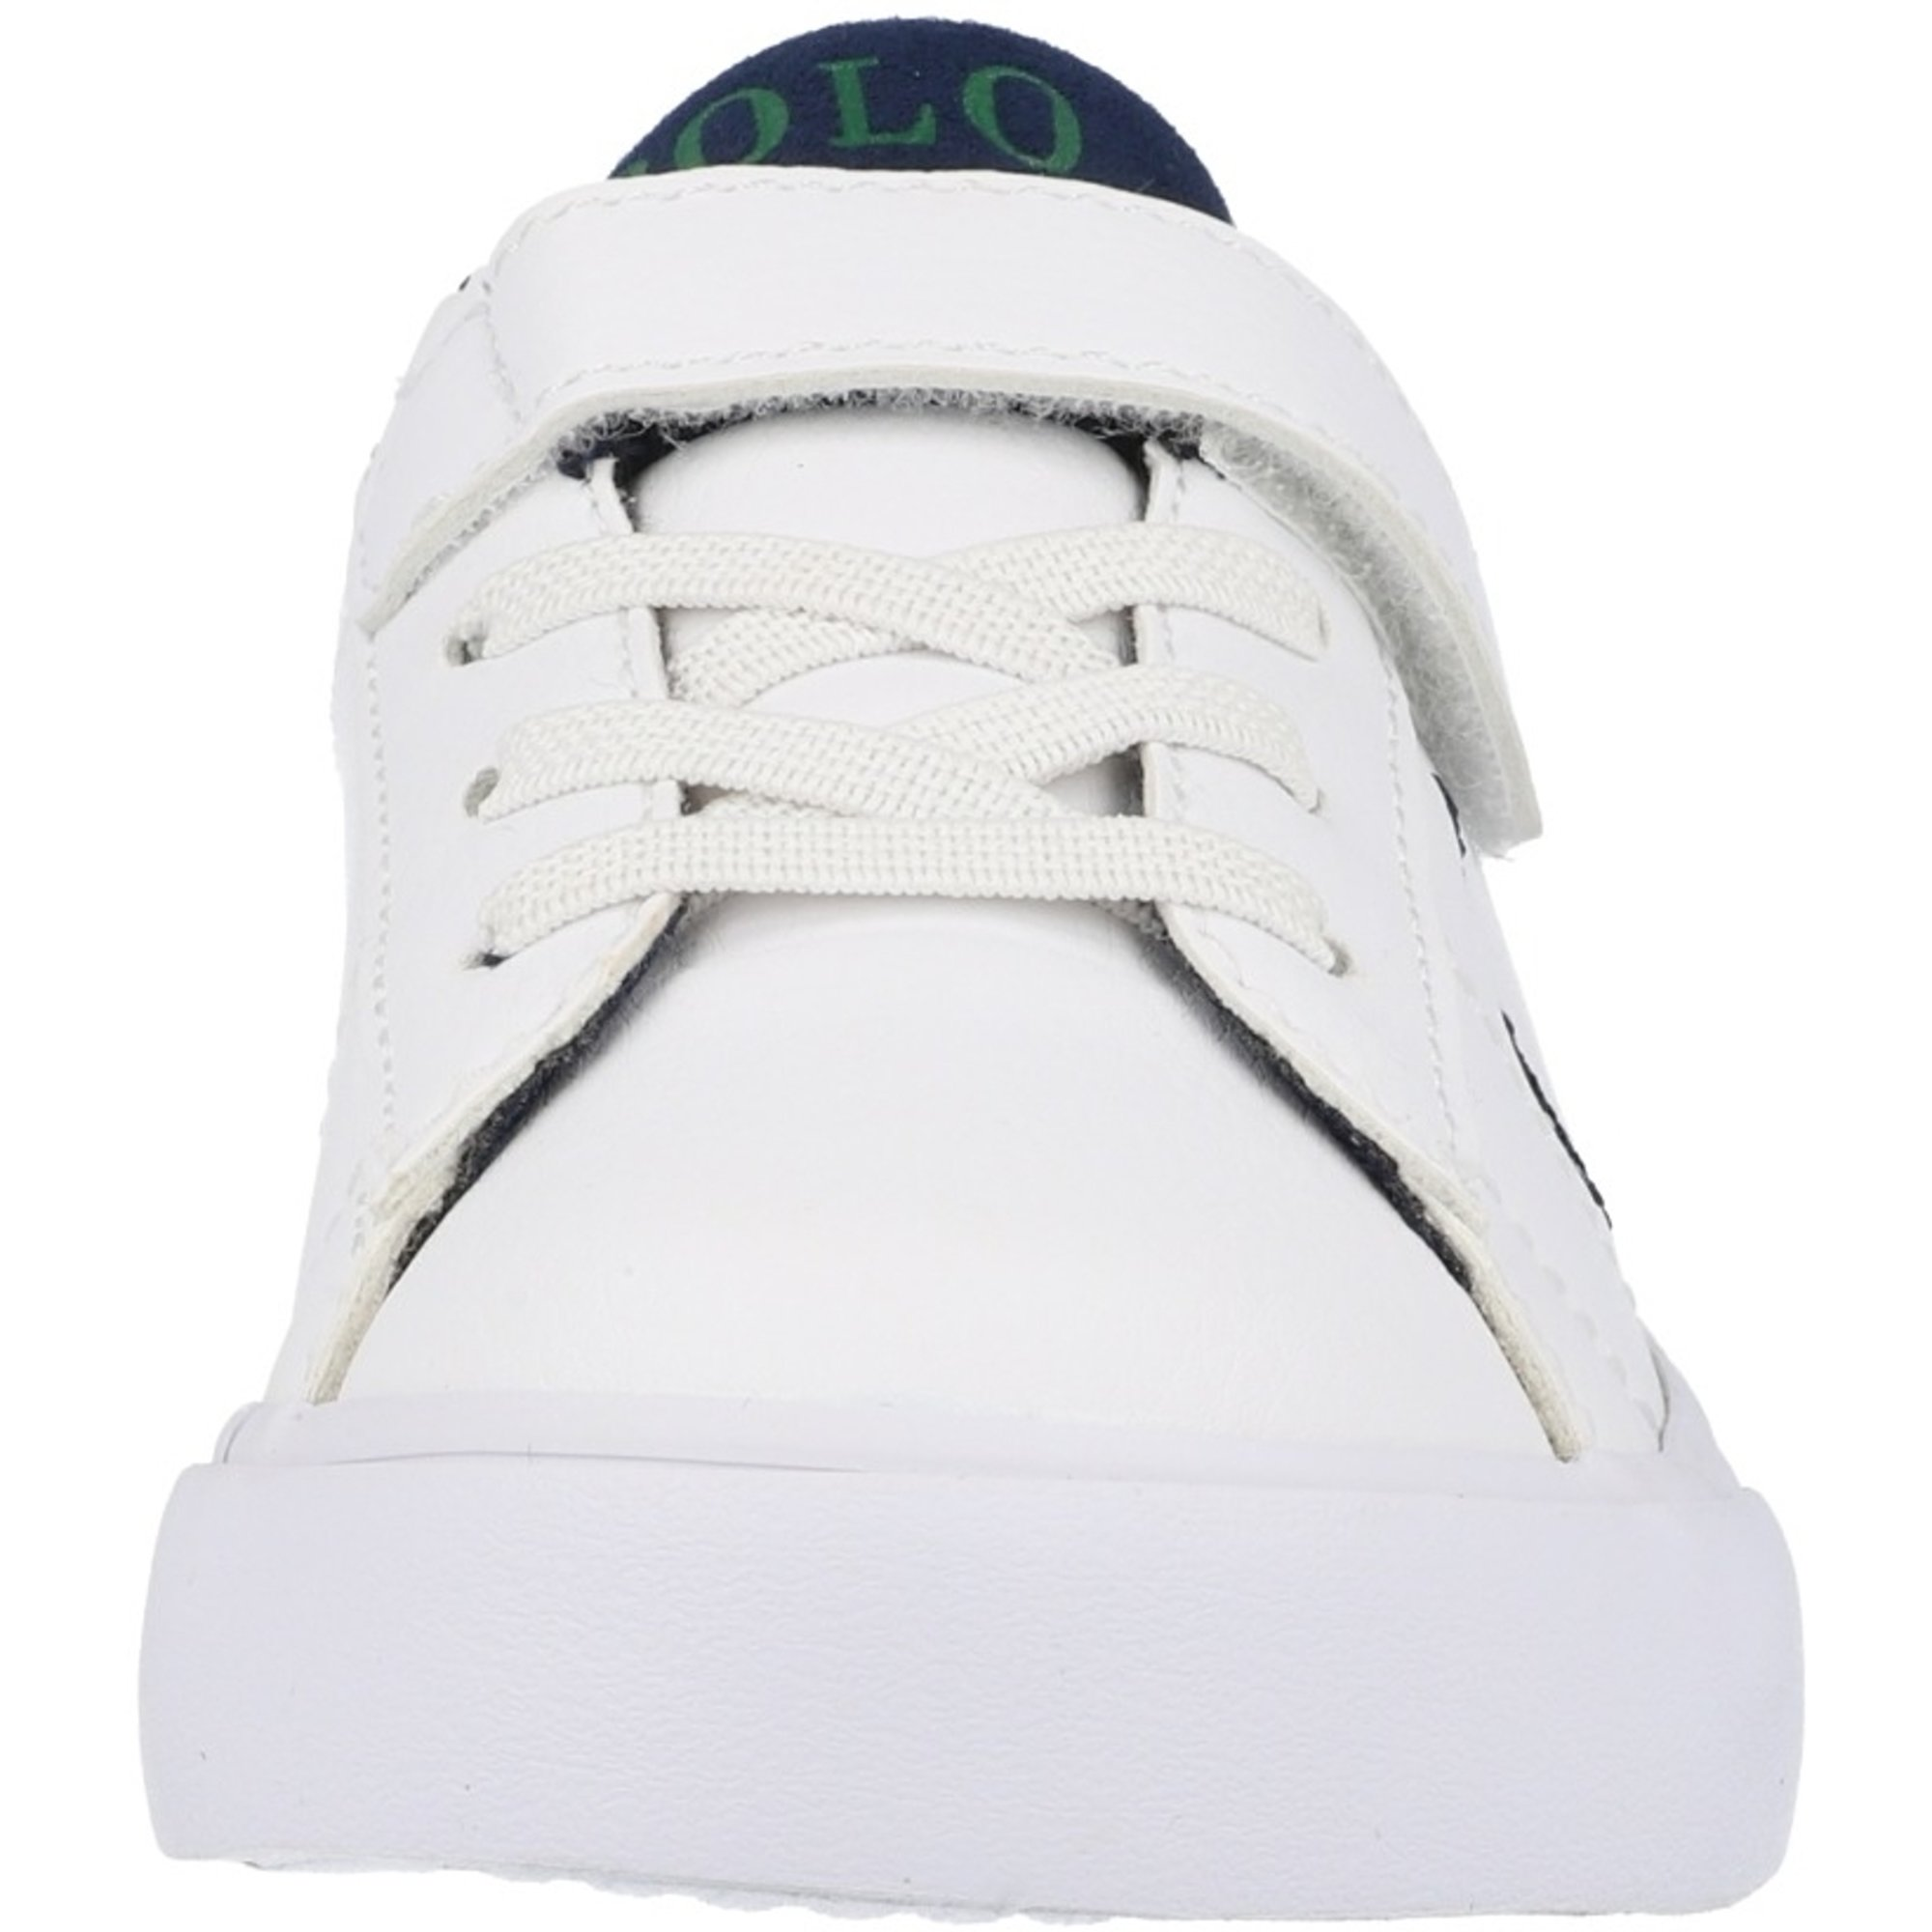 Polo Ralph Lauren Theron III PS C White/Navy Tumbled